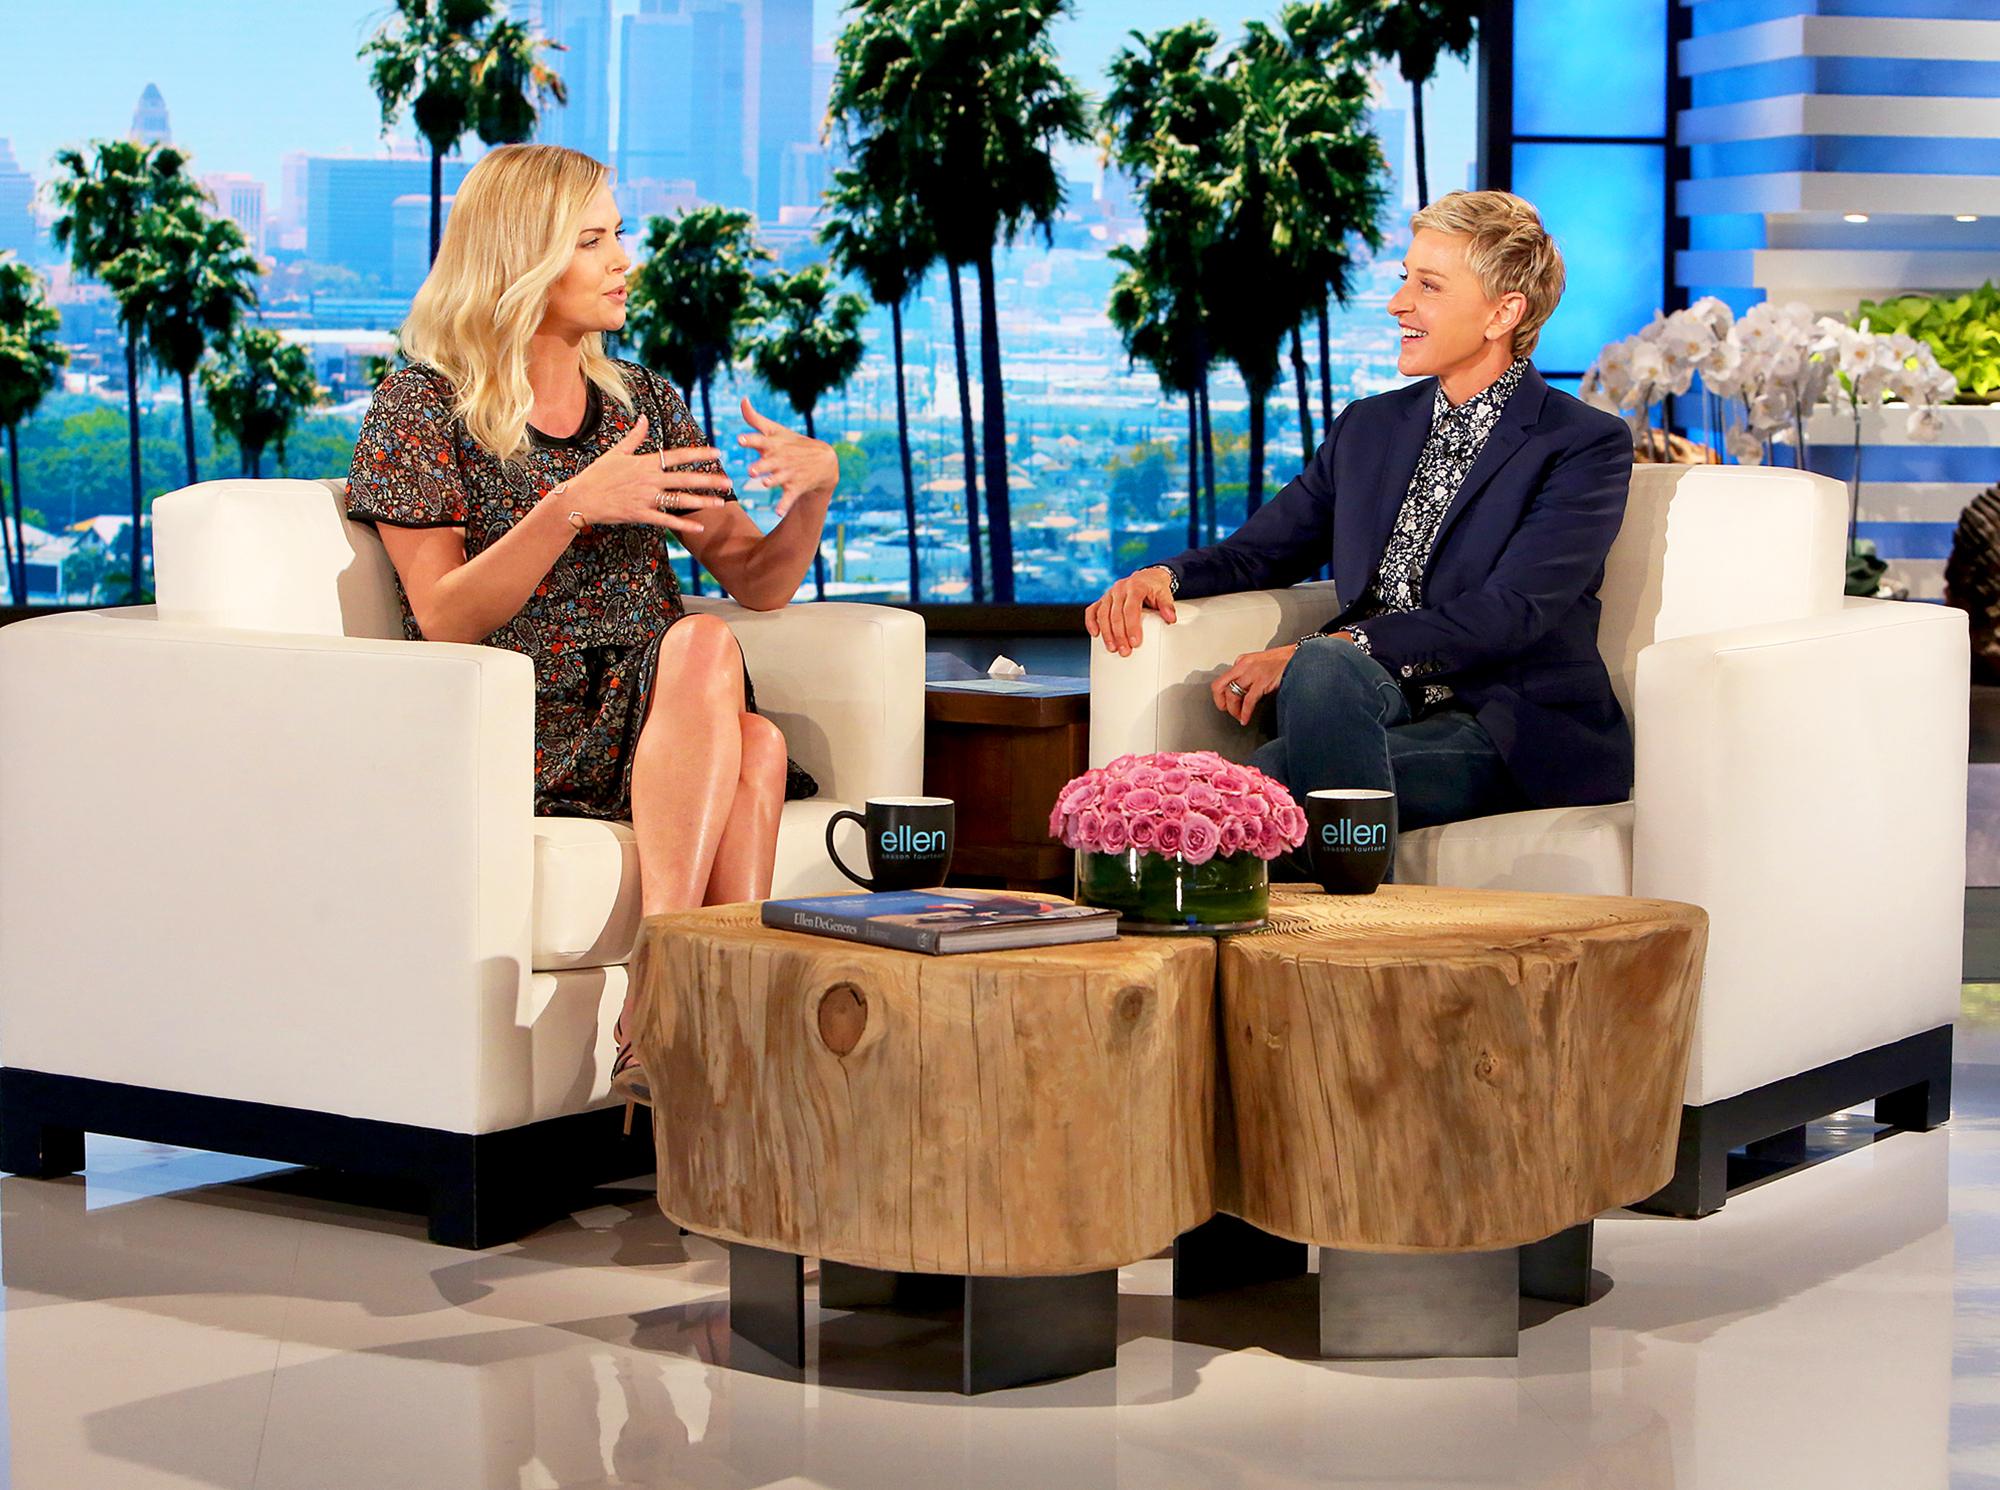 Charlize Theron and Ellen DeGeneres